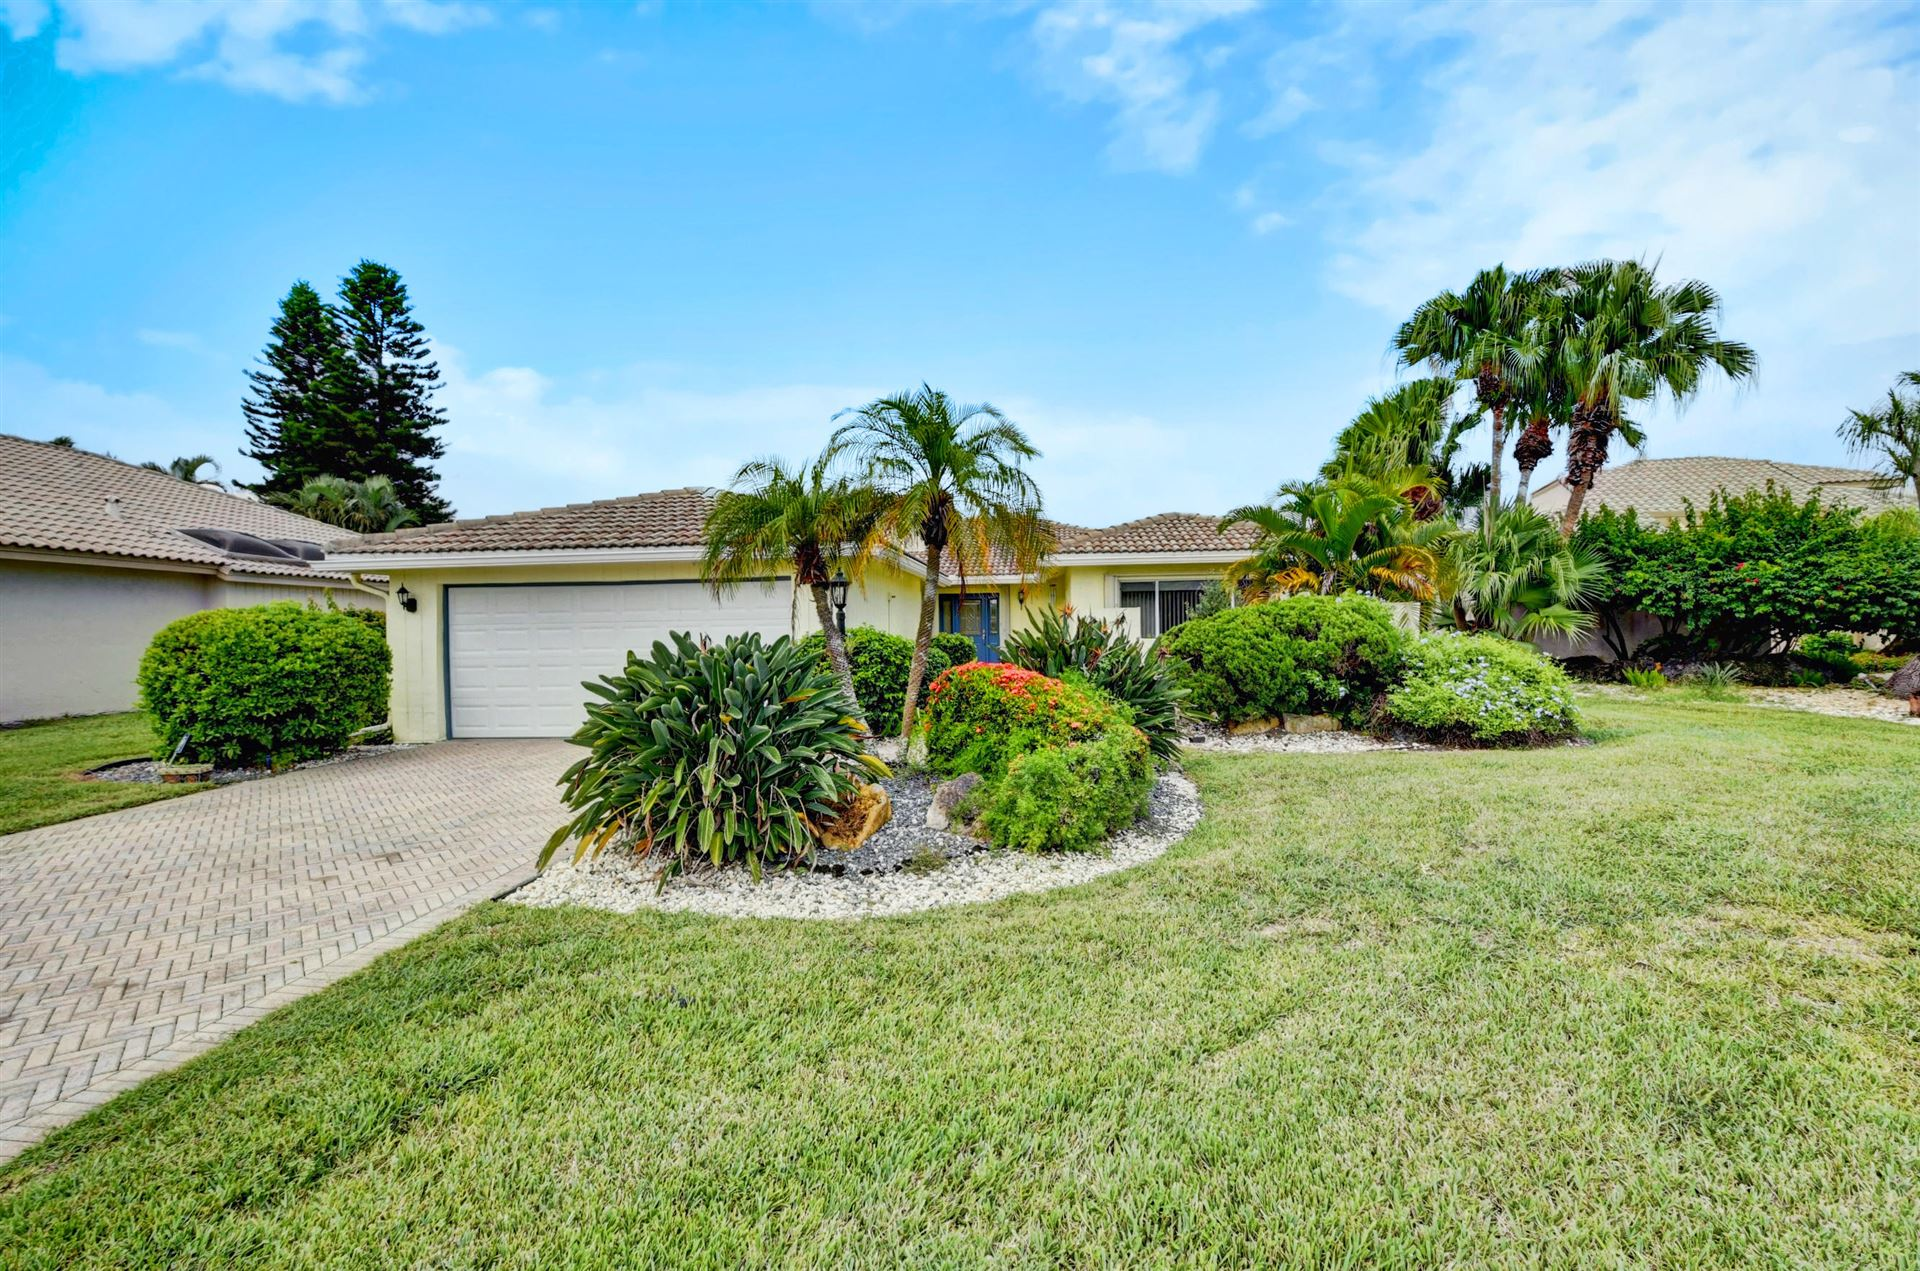 36 Woods Lane, Boynton Beach, FL 33436 - #: RX-10654303